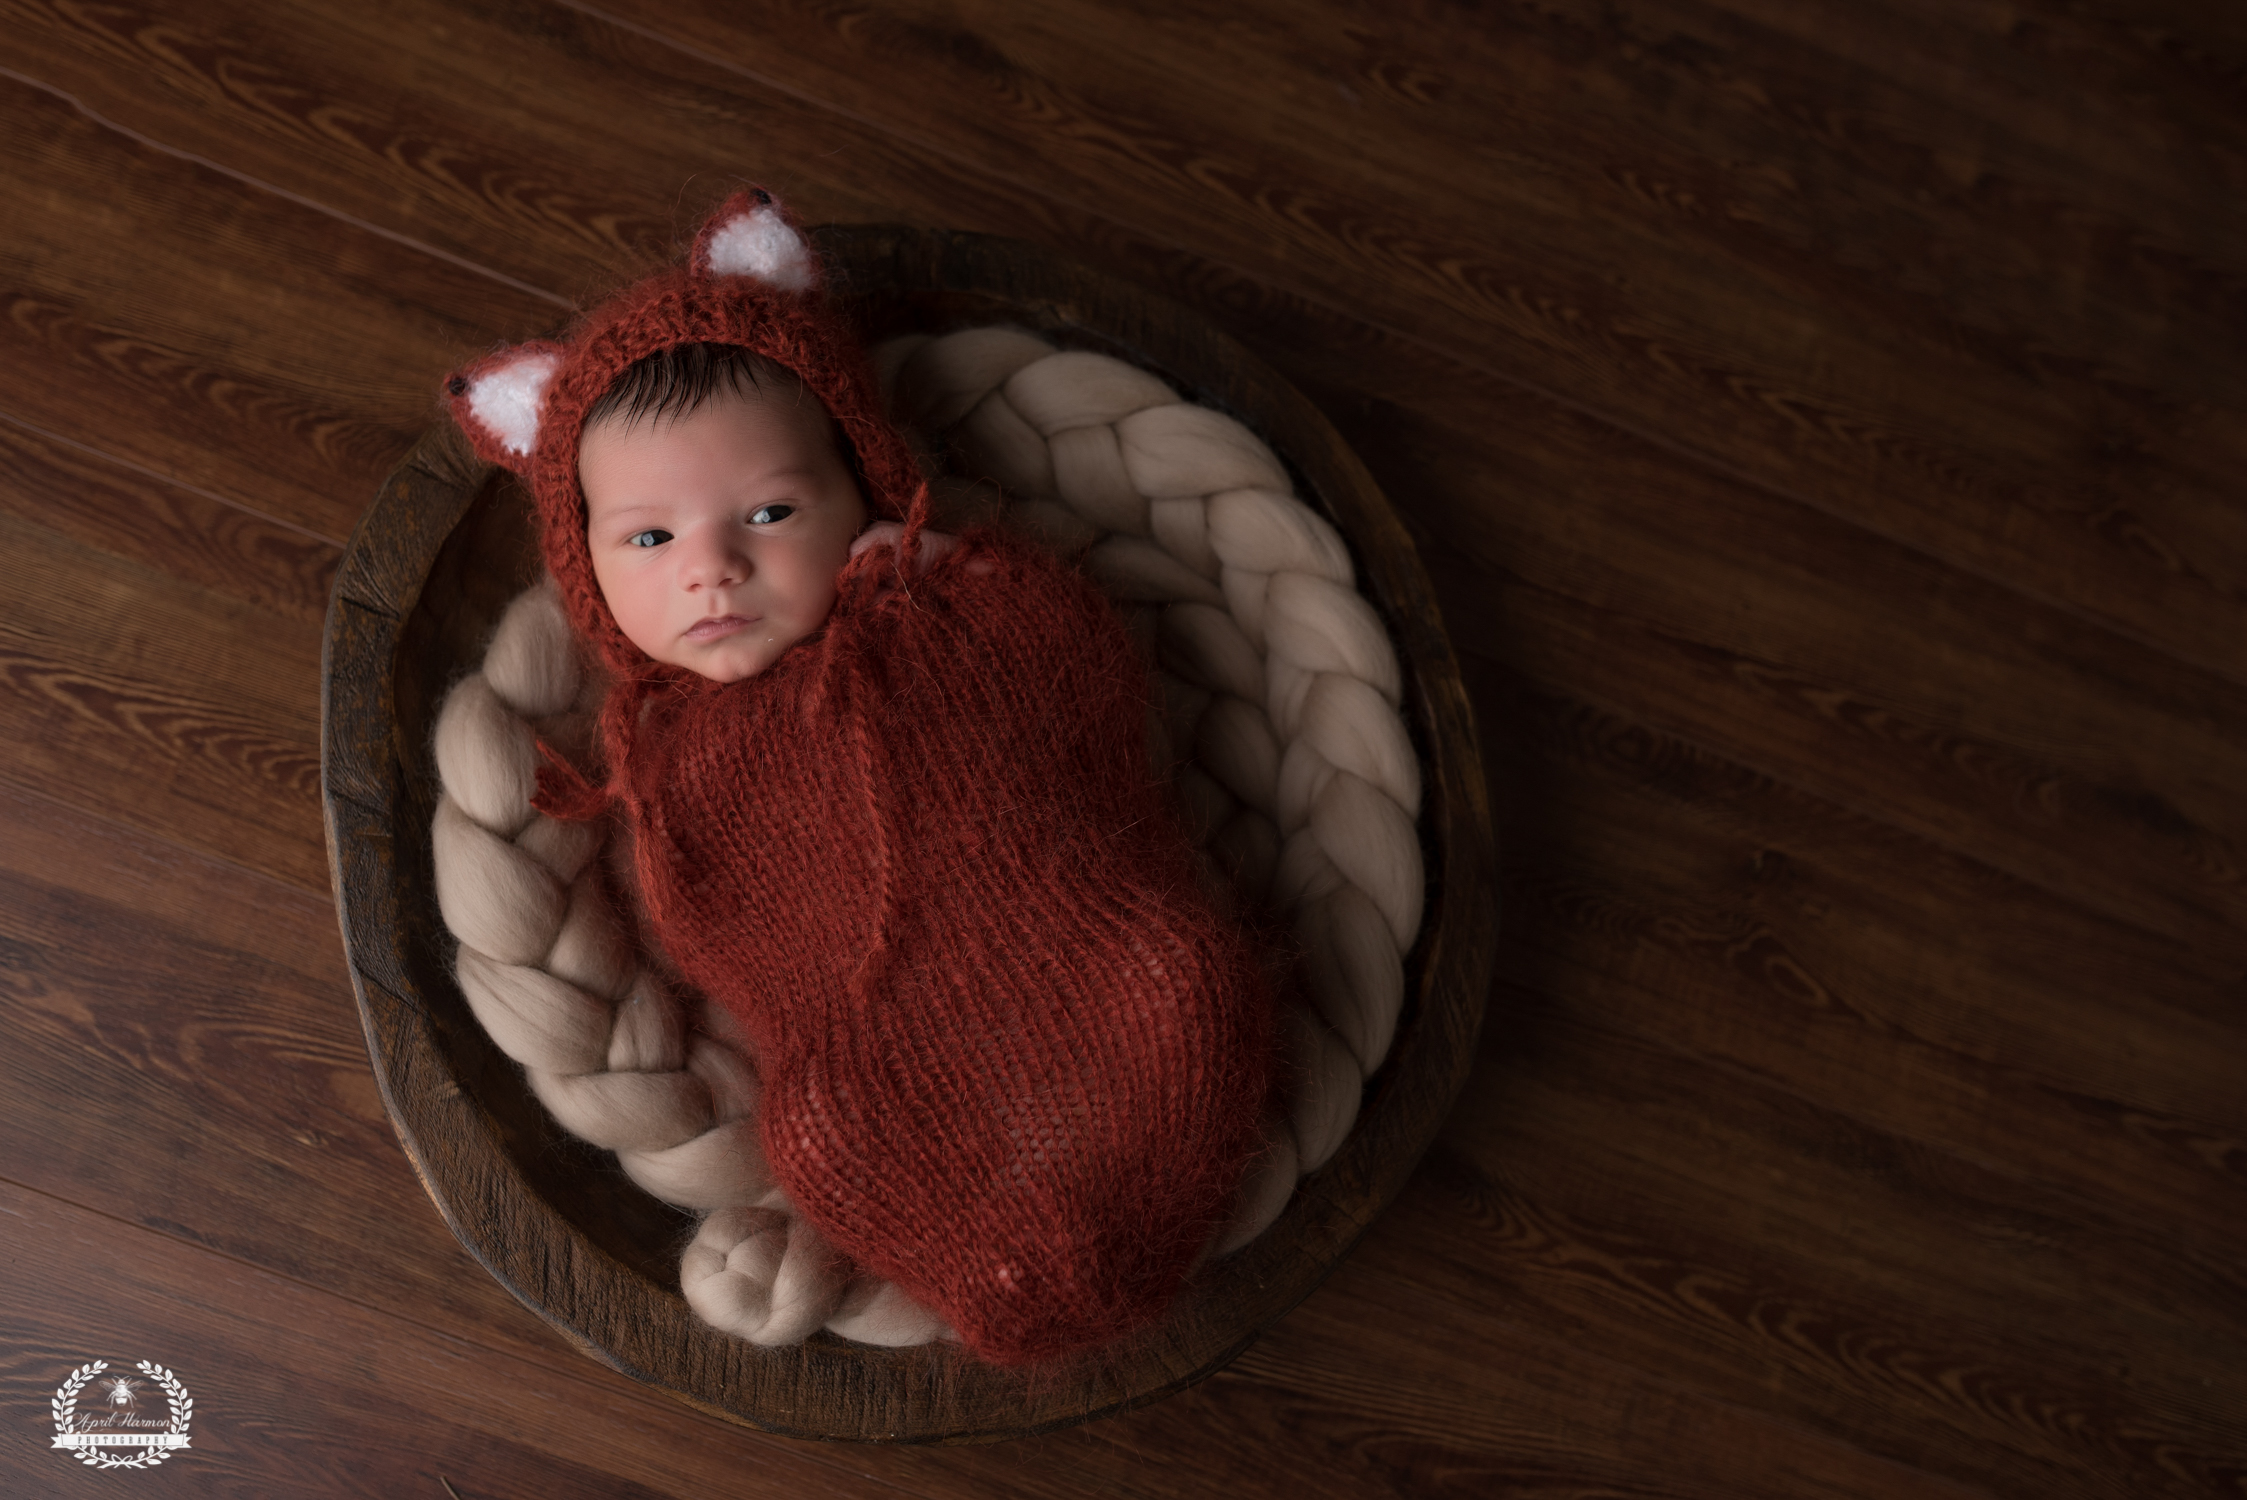 southwest-kansas-newborn-photography26.jpg